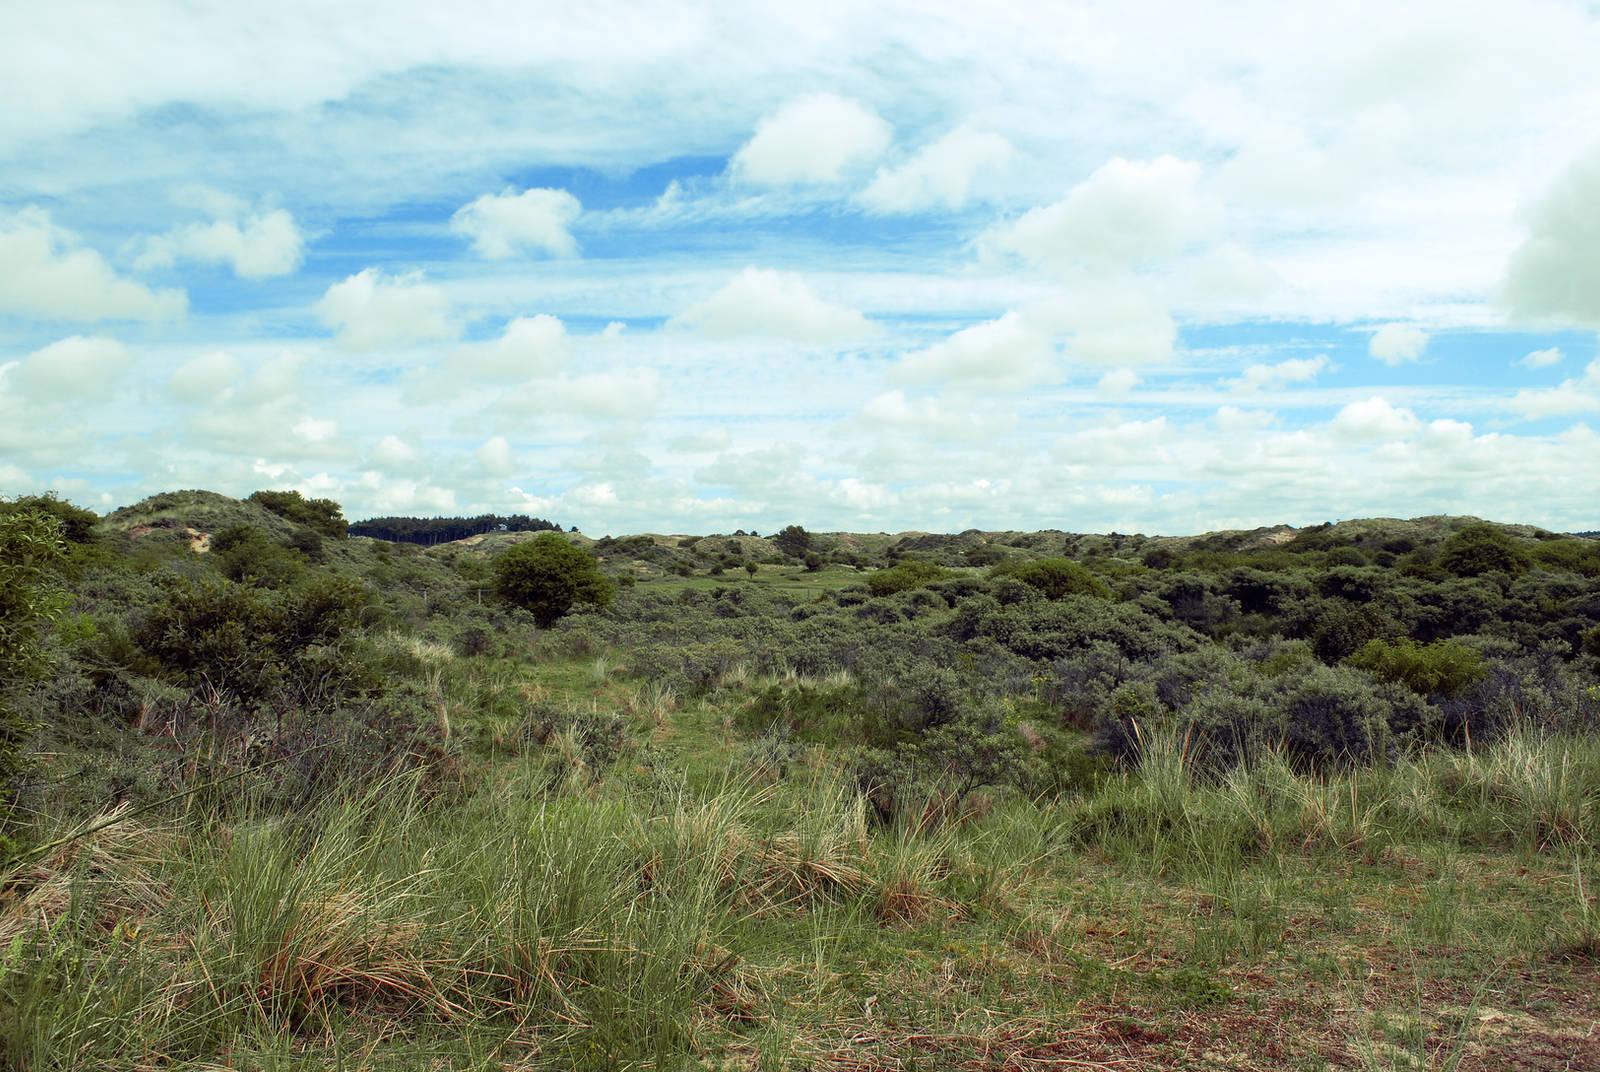 Dunes Stock 3 by Sed-rah-Stock